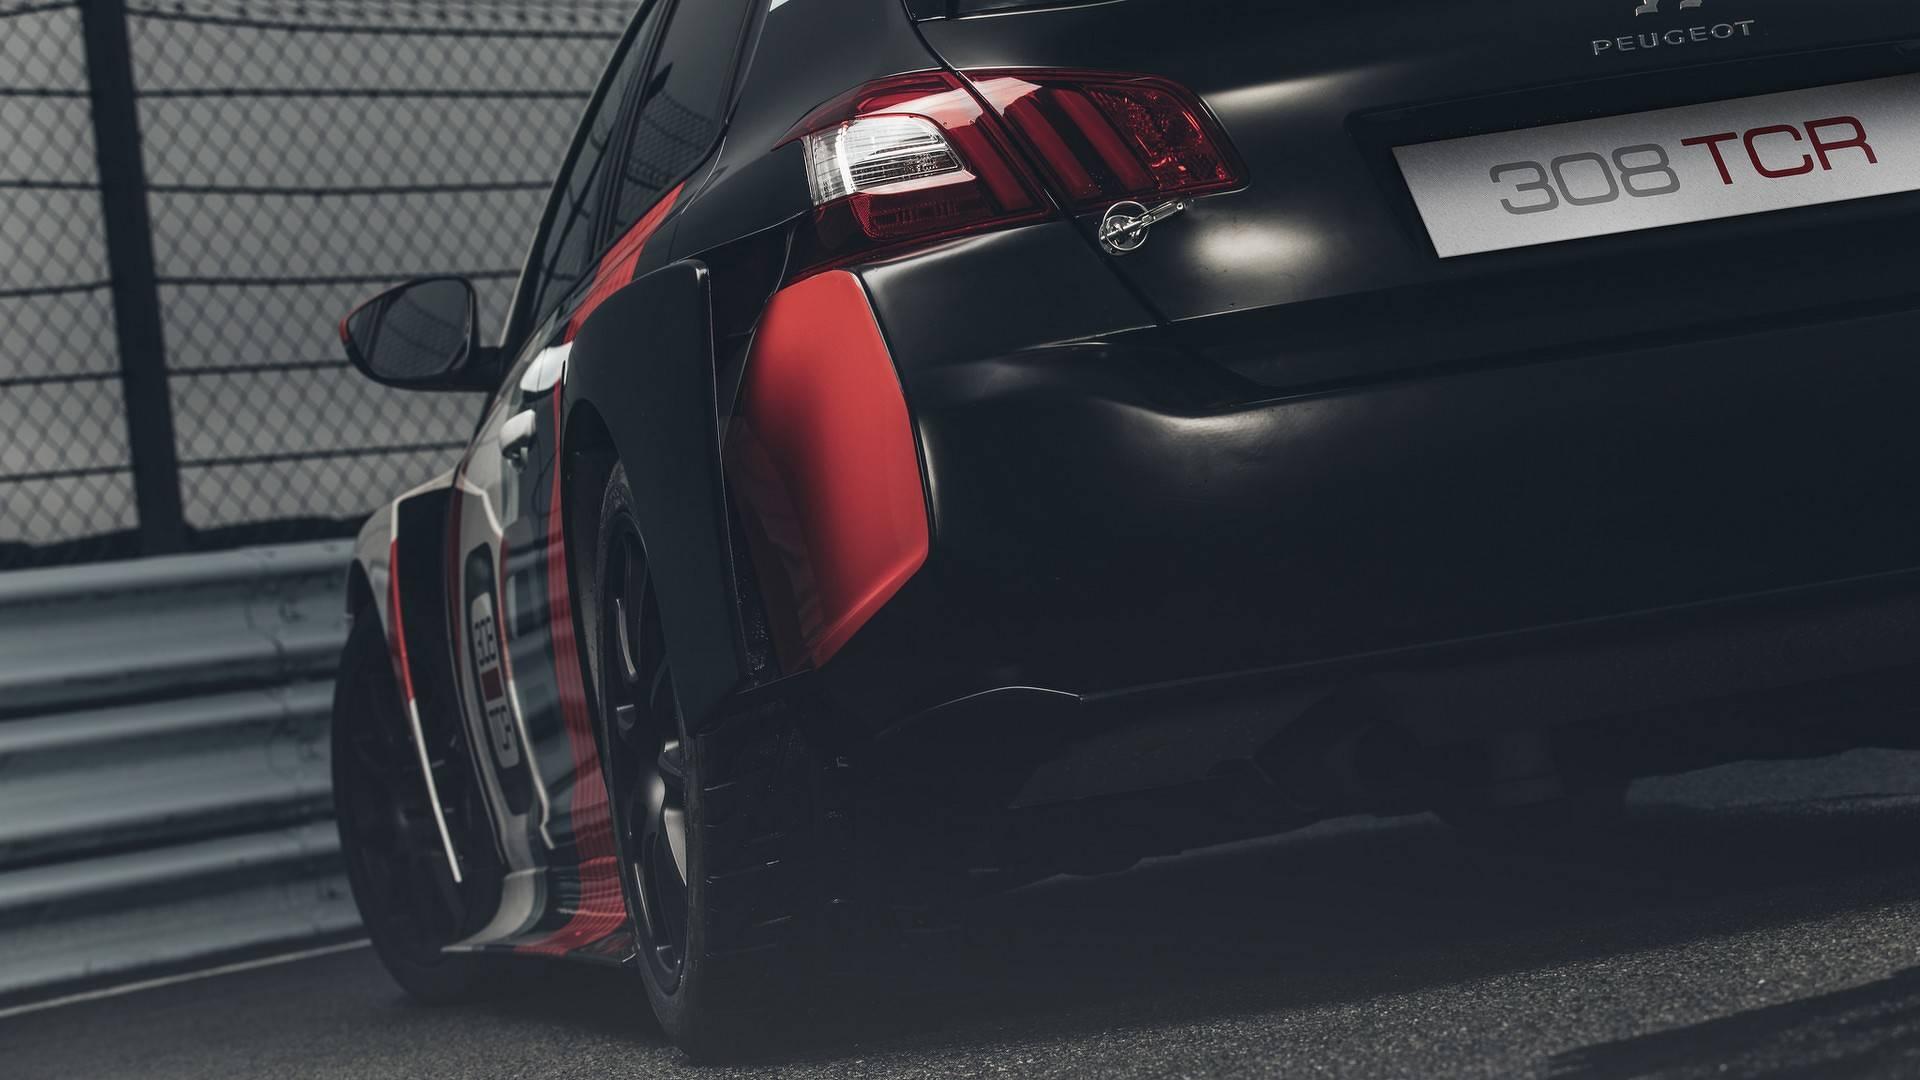 Peugeot 308 TCR 2018 (19)